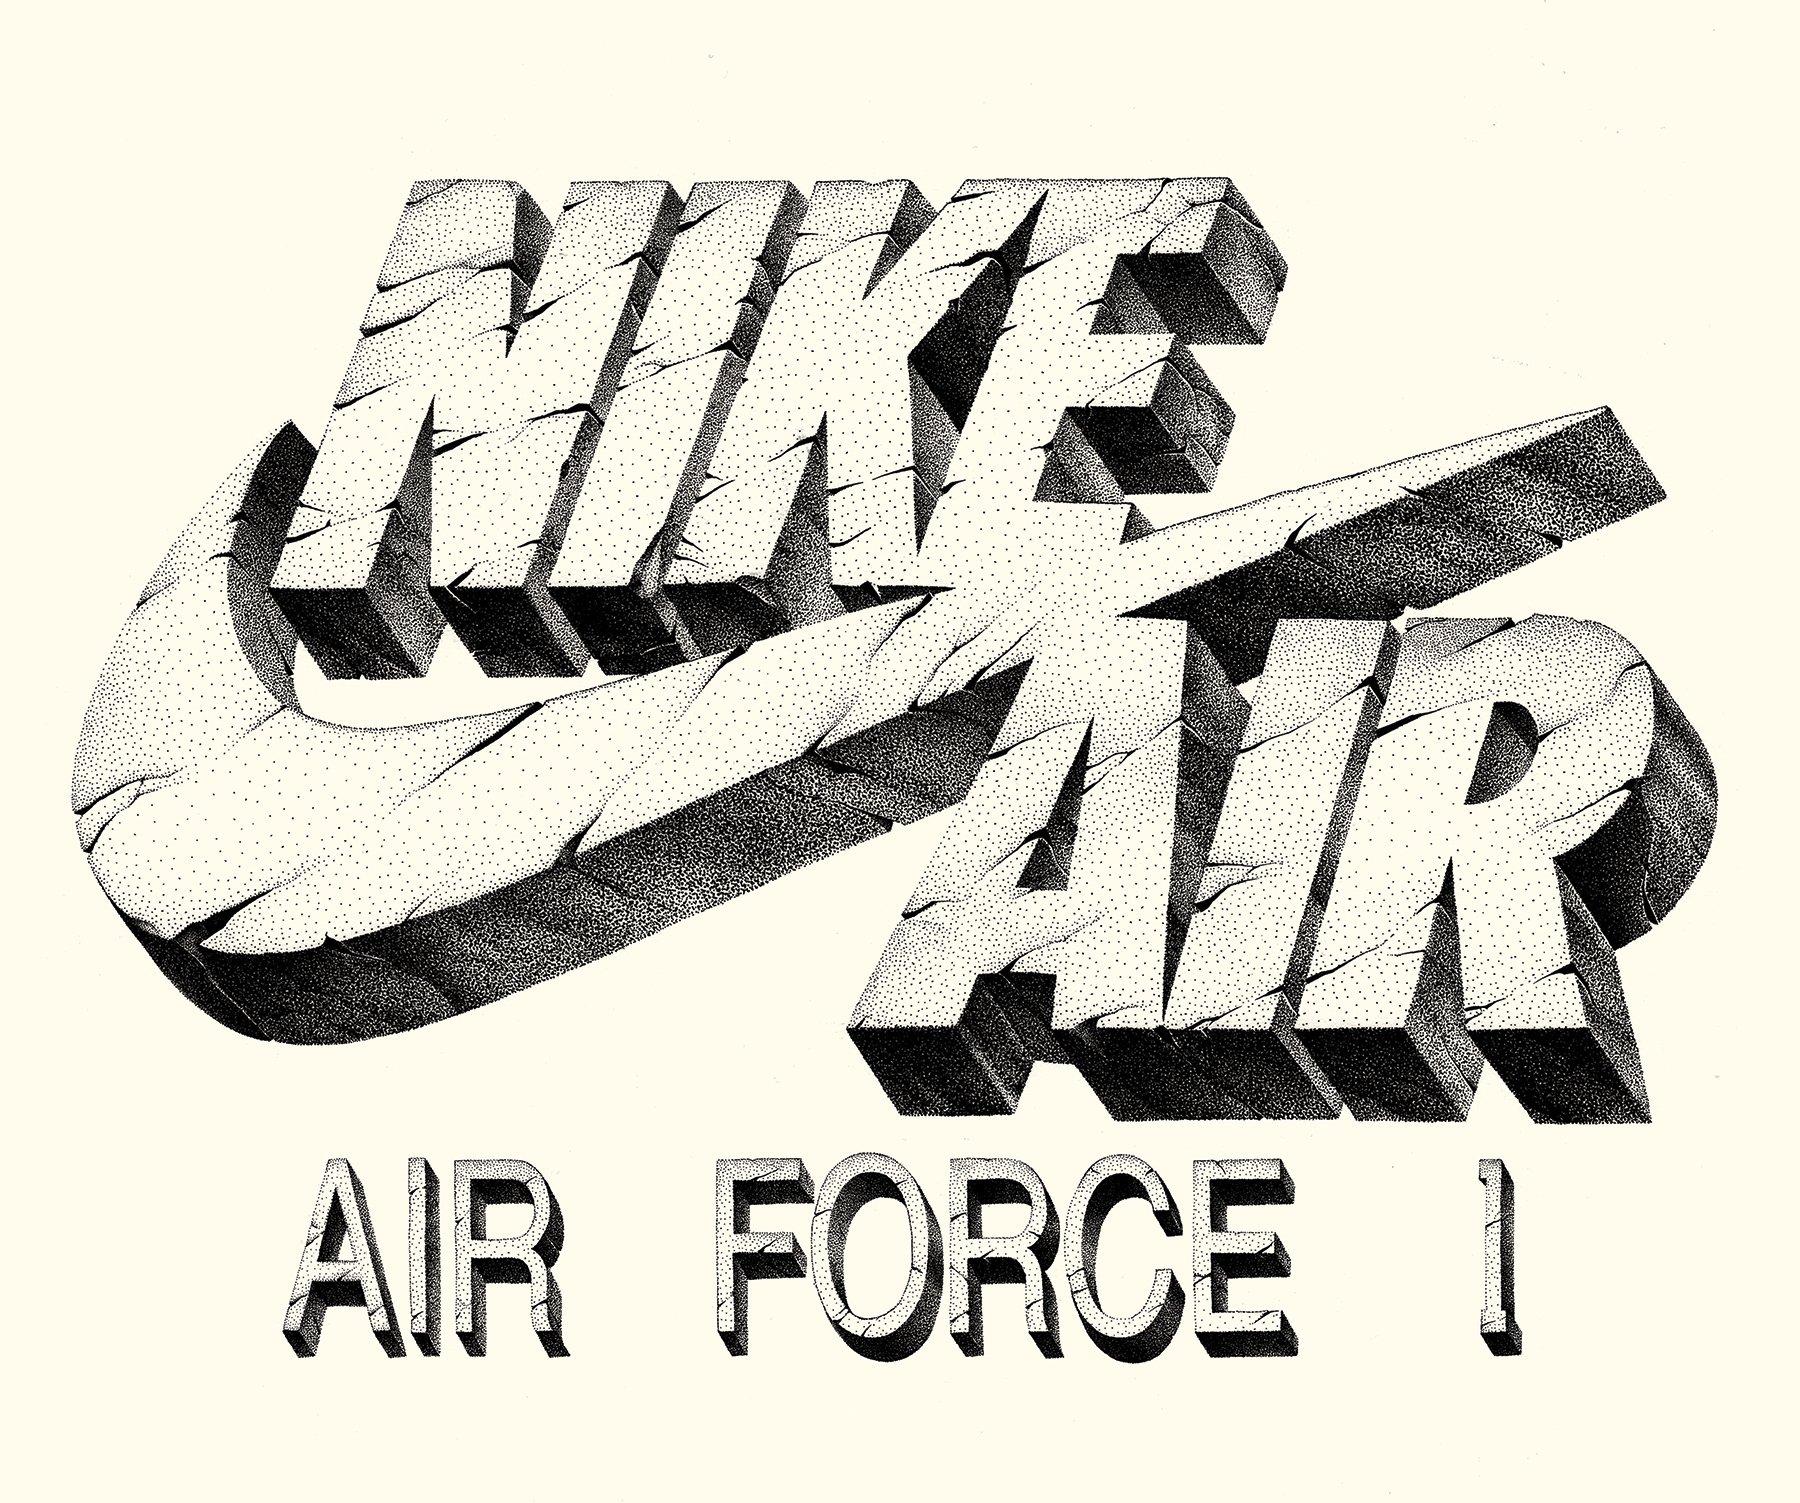 NIKE AIR FORCE 1 DUCKBOOT BLACK / BROWN - 42 DO 46